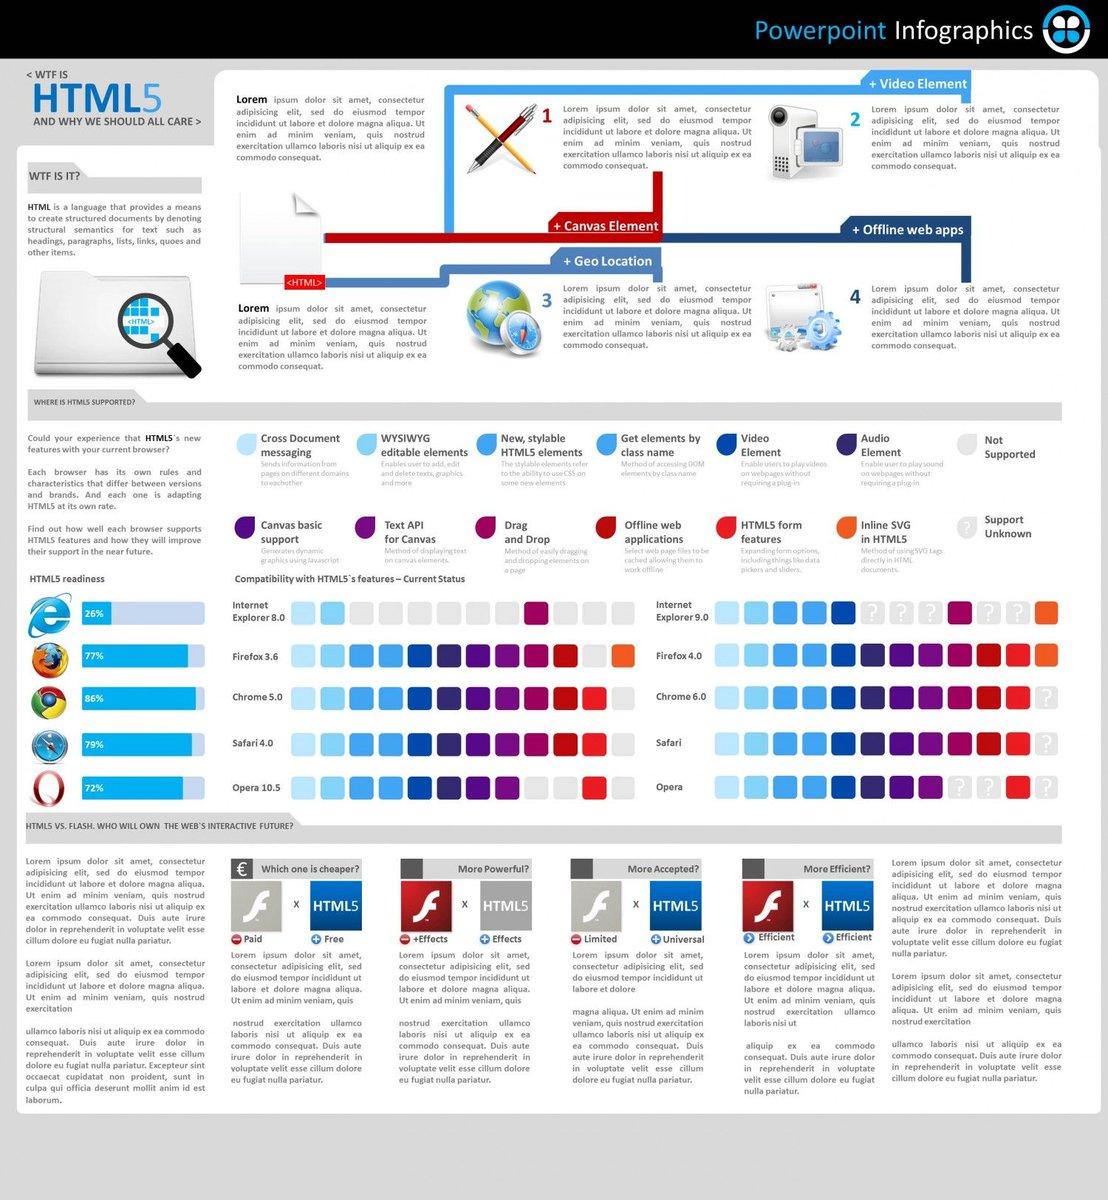 Compatibility with #HTML5 features  #infographic #IT #Tech #Java #coding #DevOps #makeyourownlane #Developer #defstar5 #Adobe<br>http://pic.twitter.com/wkePMZJtnY